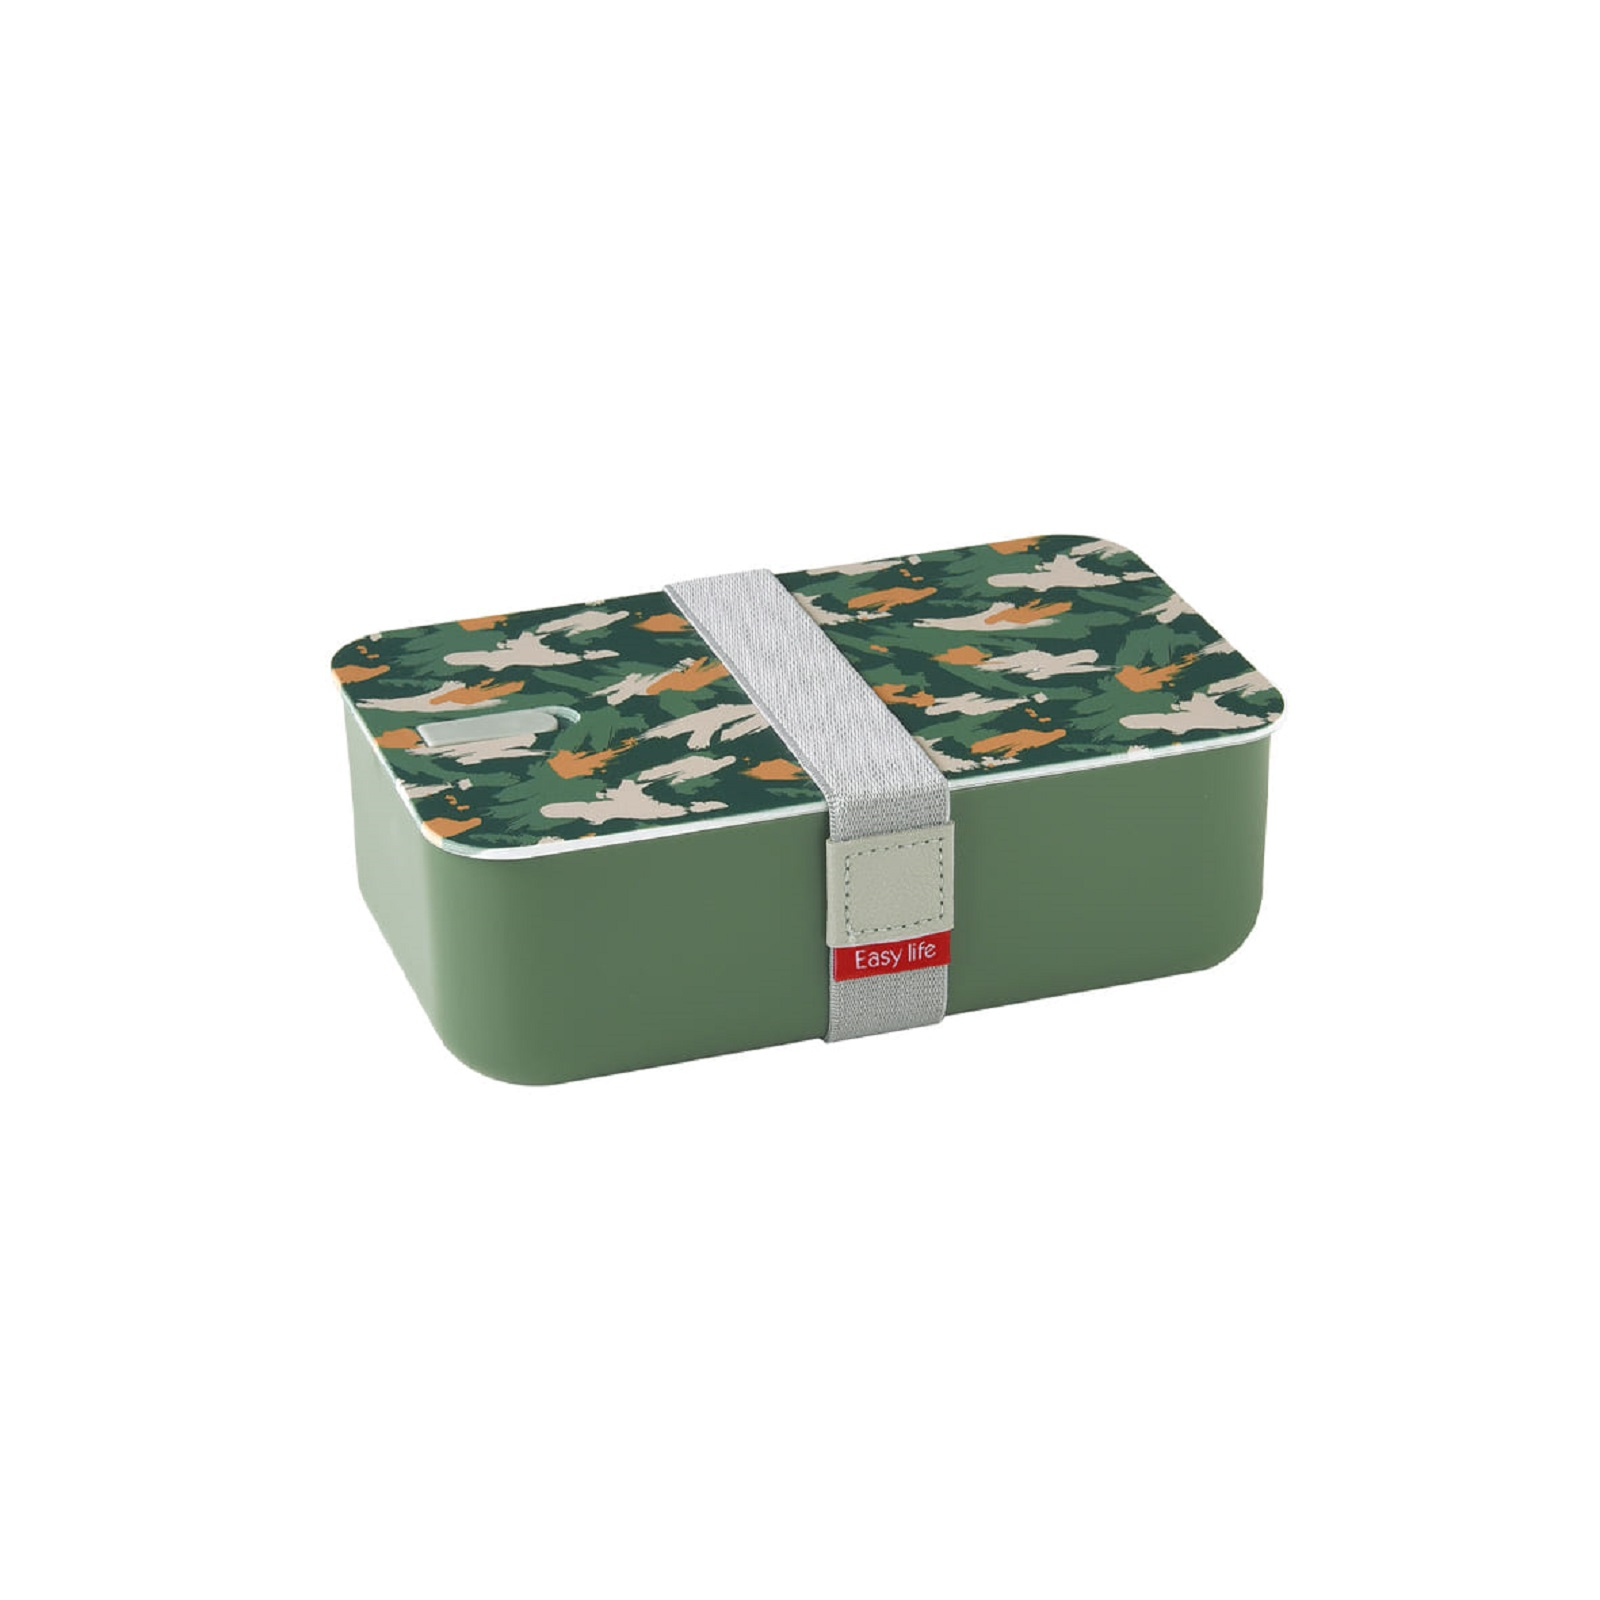 Онлайн каталог PROMENU: Ланч-бокс Easy Life, объем 1 л, 19 x 12 x 6,5 см, зеленый  2501 ABS3